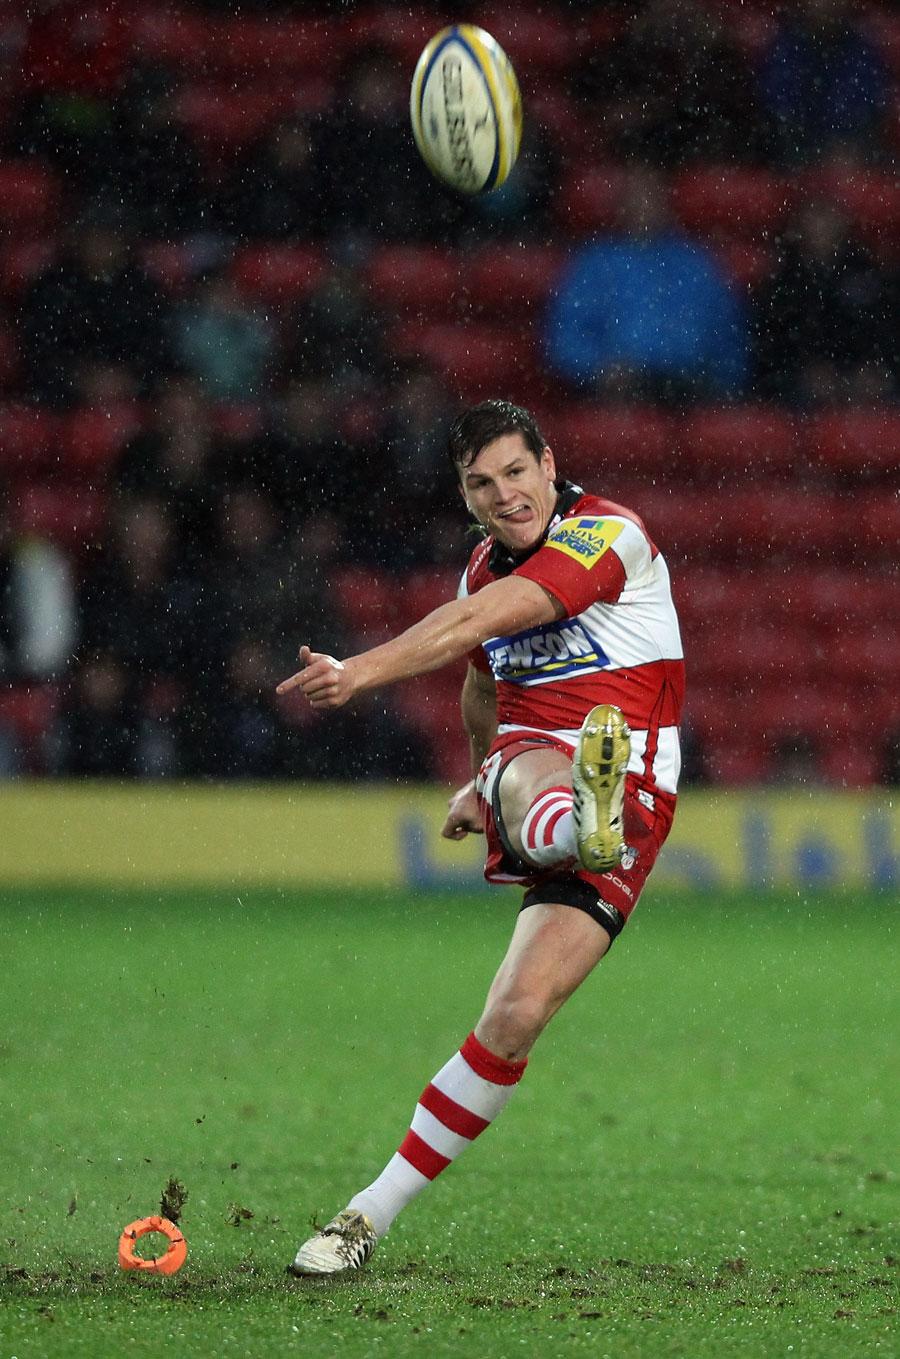 Gloucester's Freddie Burns slots a kick